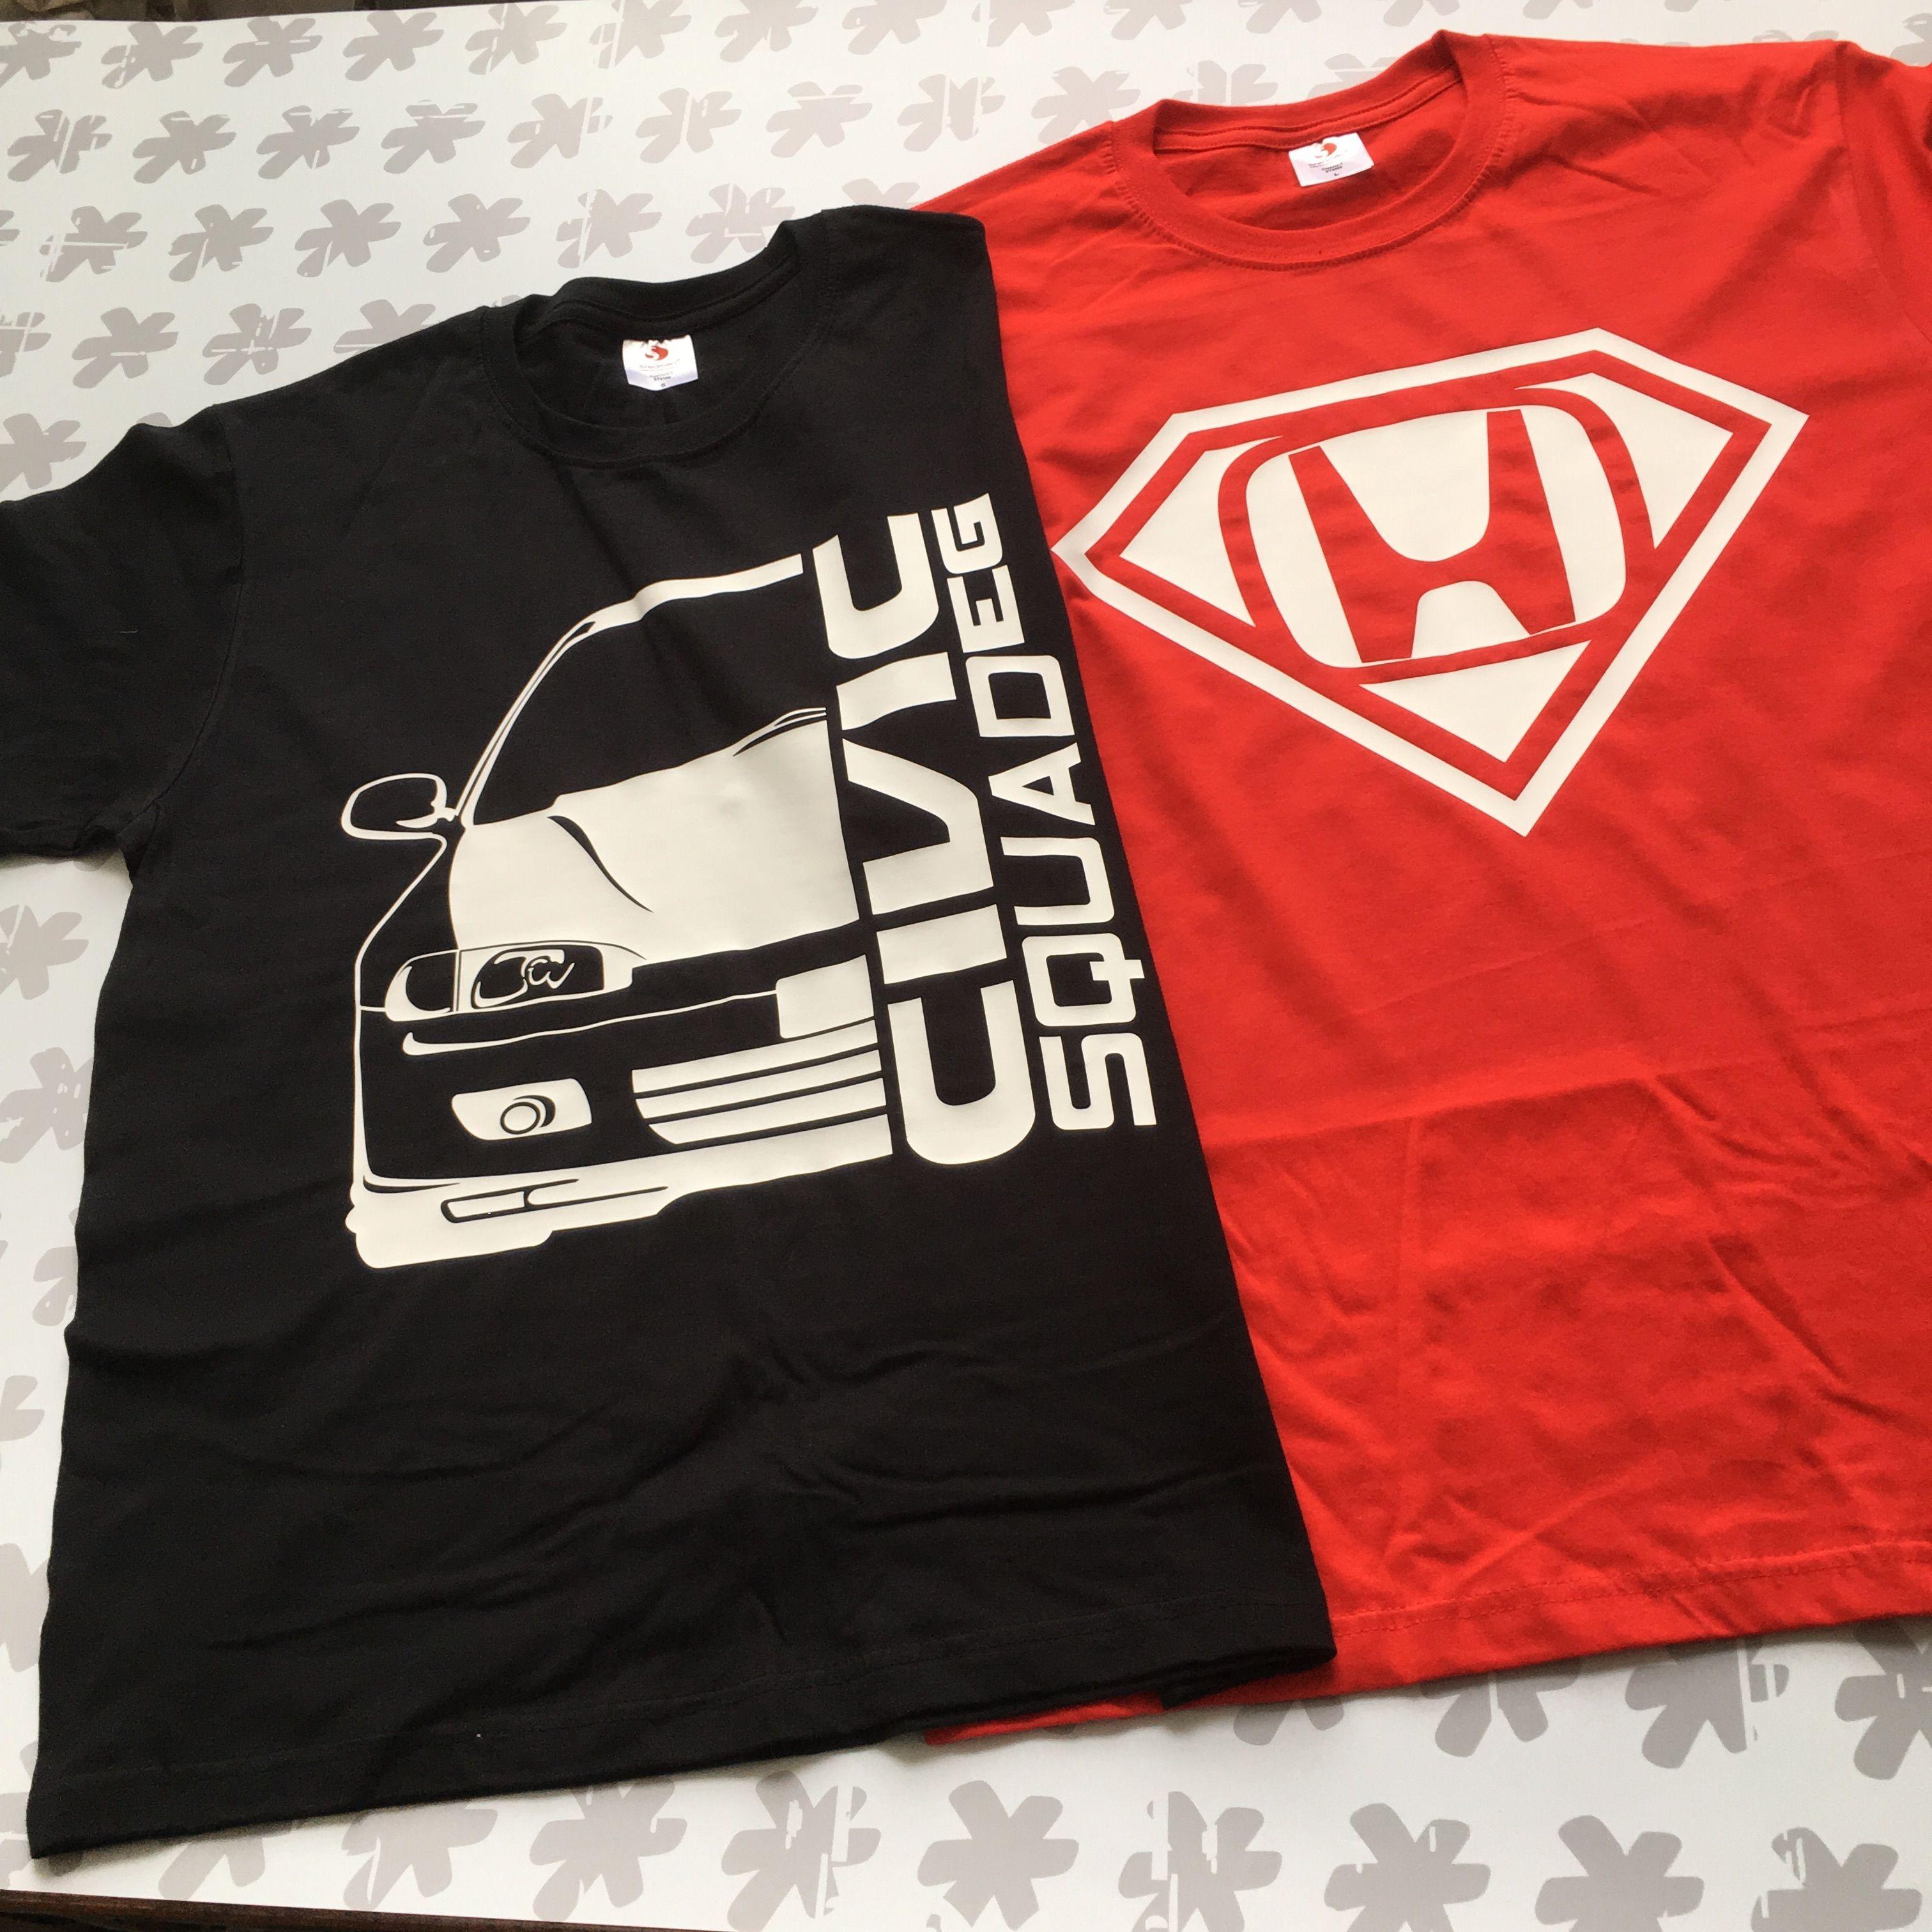 Honda ACCORD T-Shirt VTEC JDM Racing Car Racing T-Shirt Adult Size S-2XL